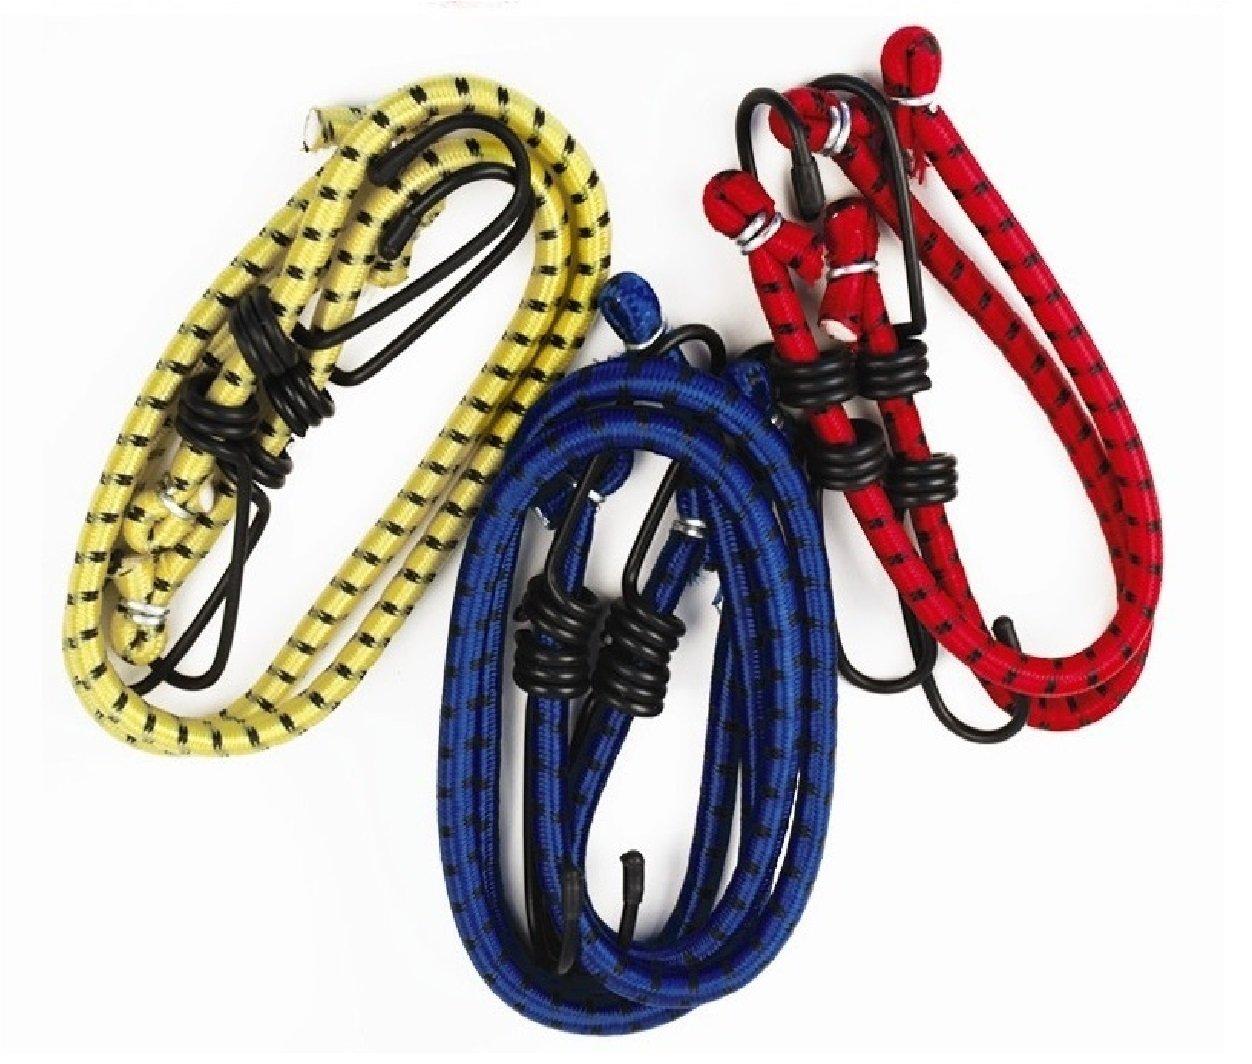 Luggage Straps//Car Ties Rope Hook Set 2x Heavy Duty 36 Long Elastic Bungee Cords